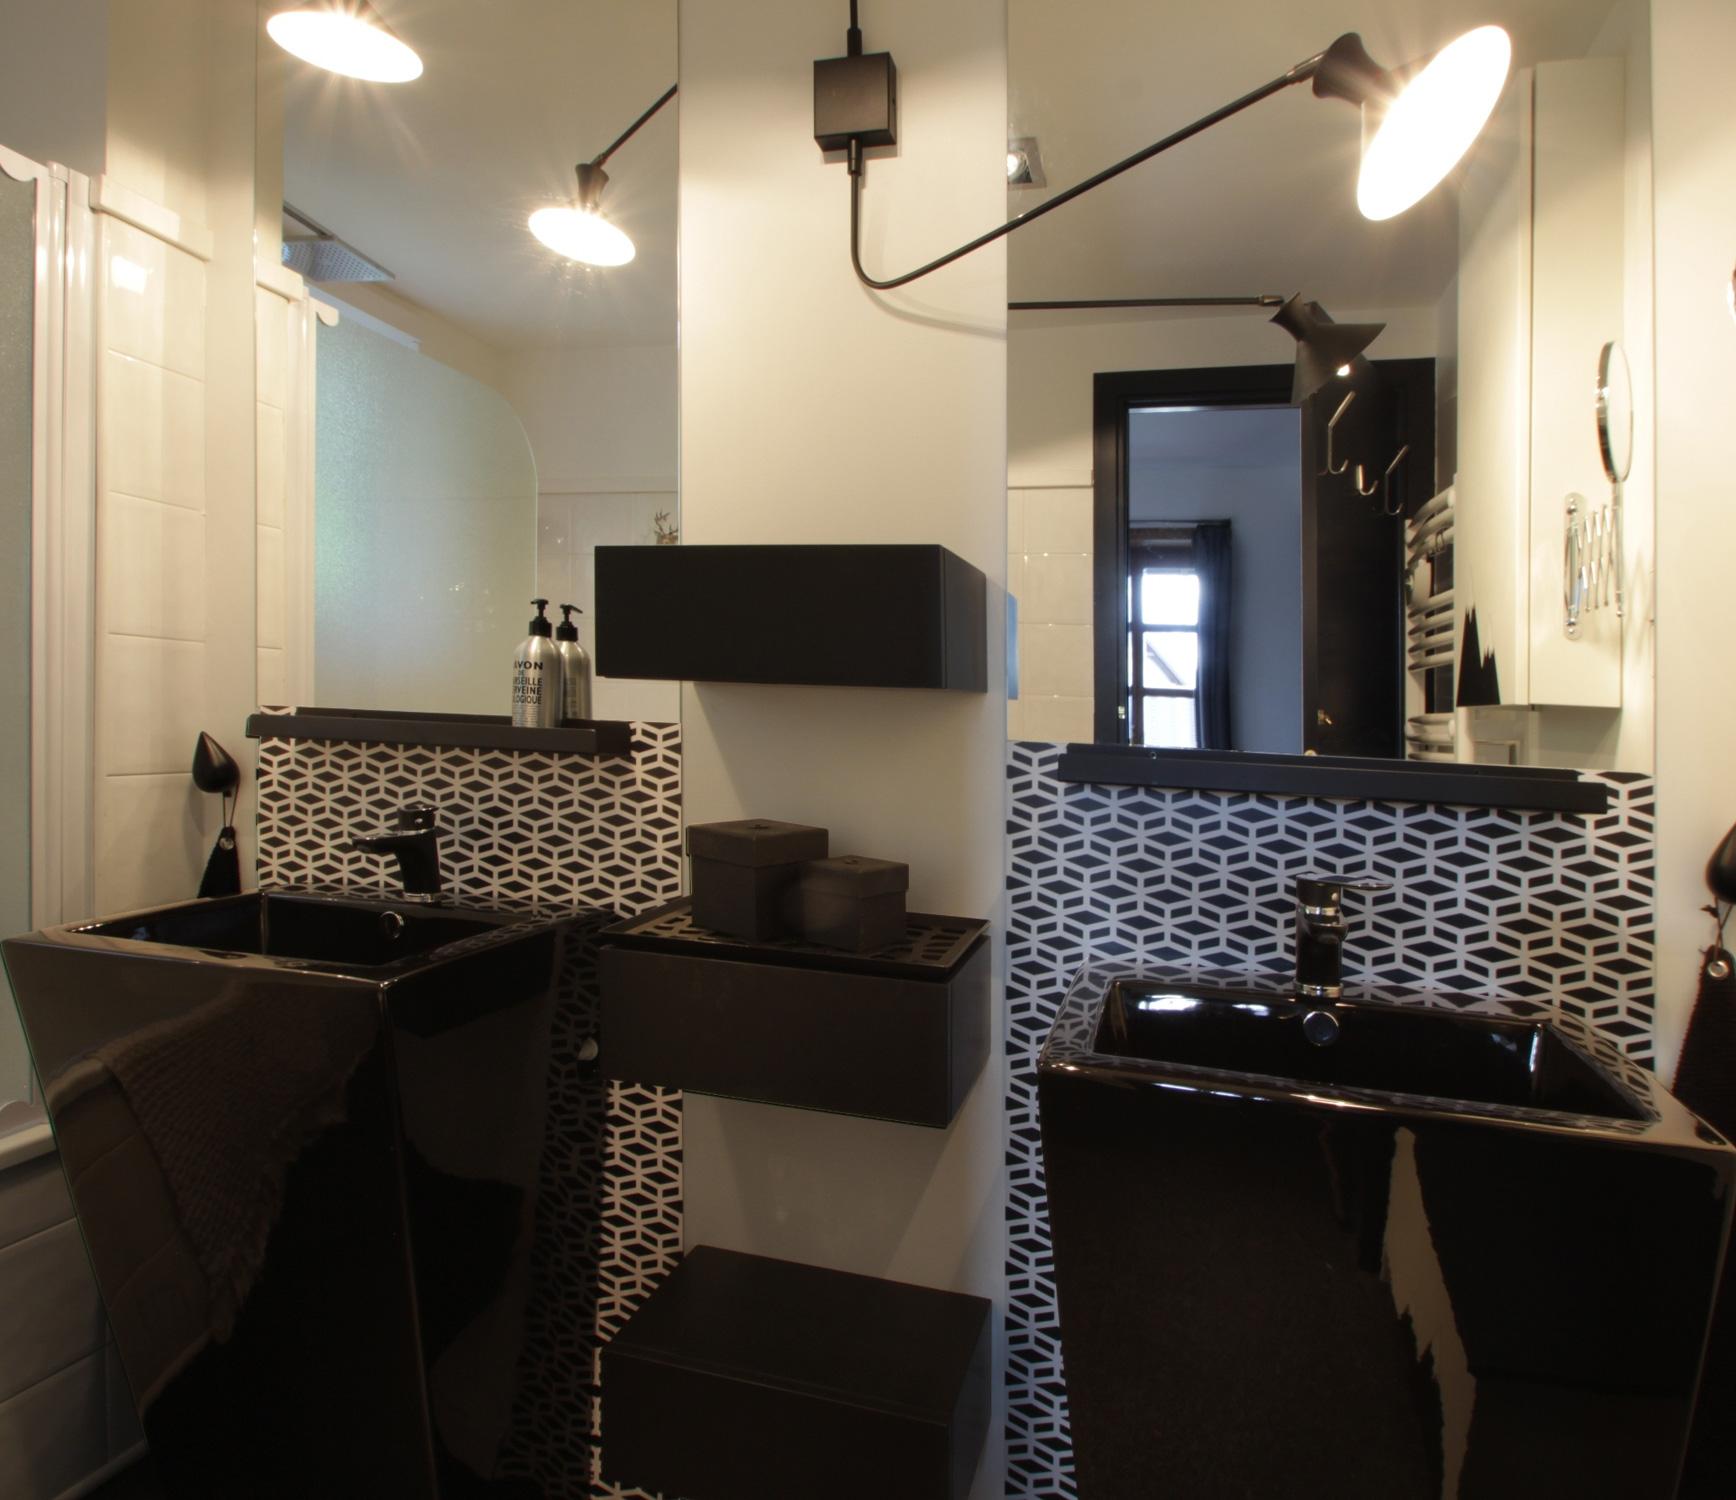 Sur mesure cr dence salle de bain malo design - Salle de bain pratique ...